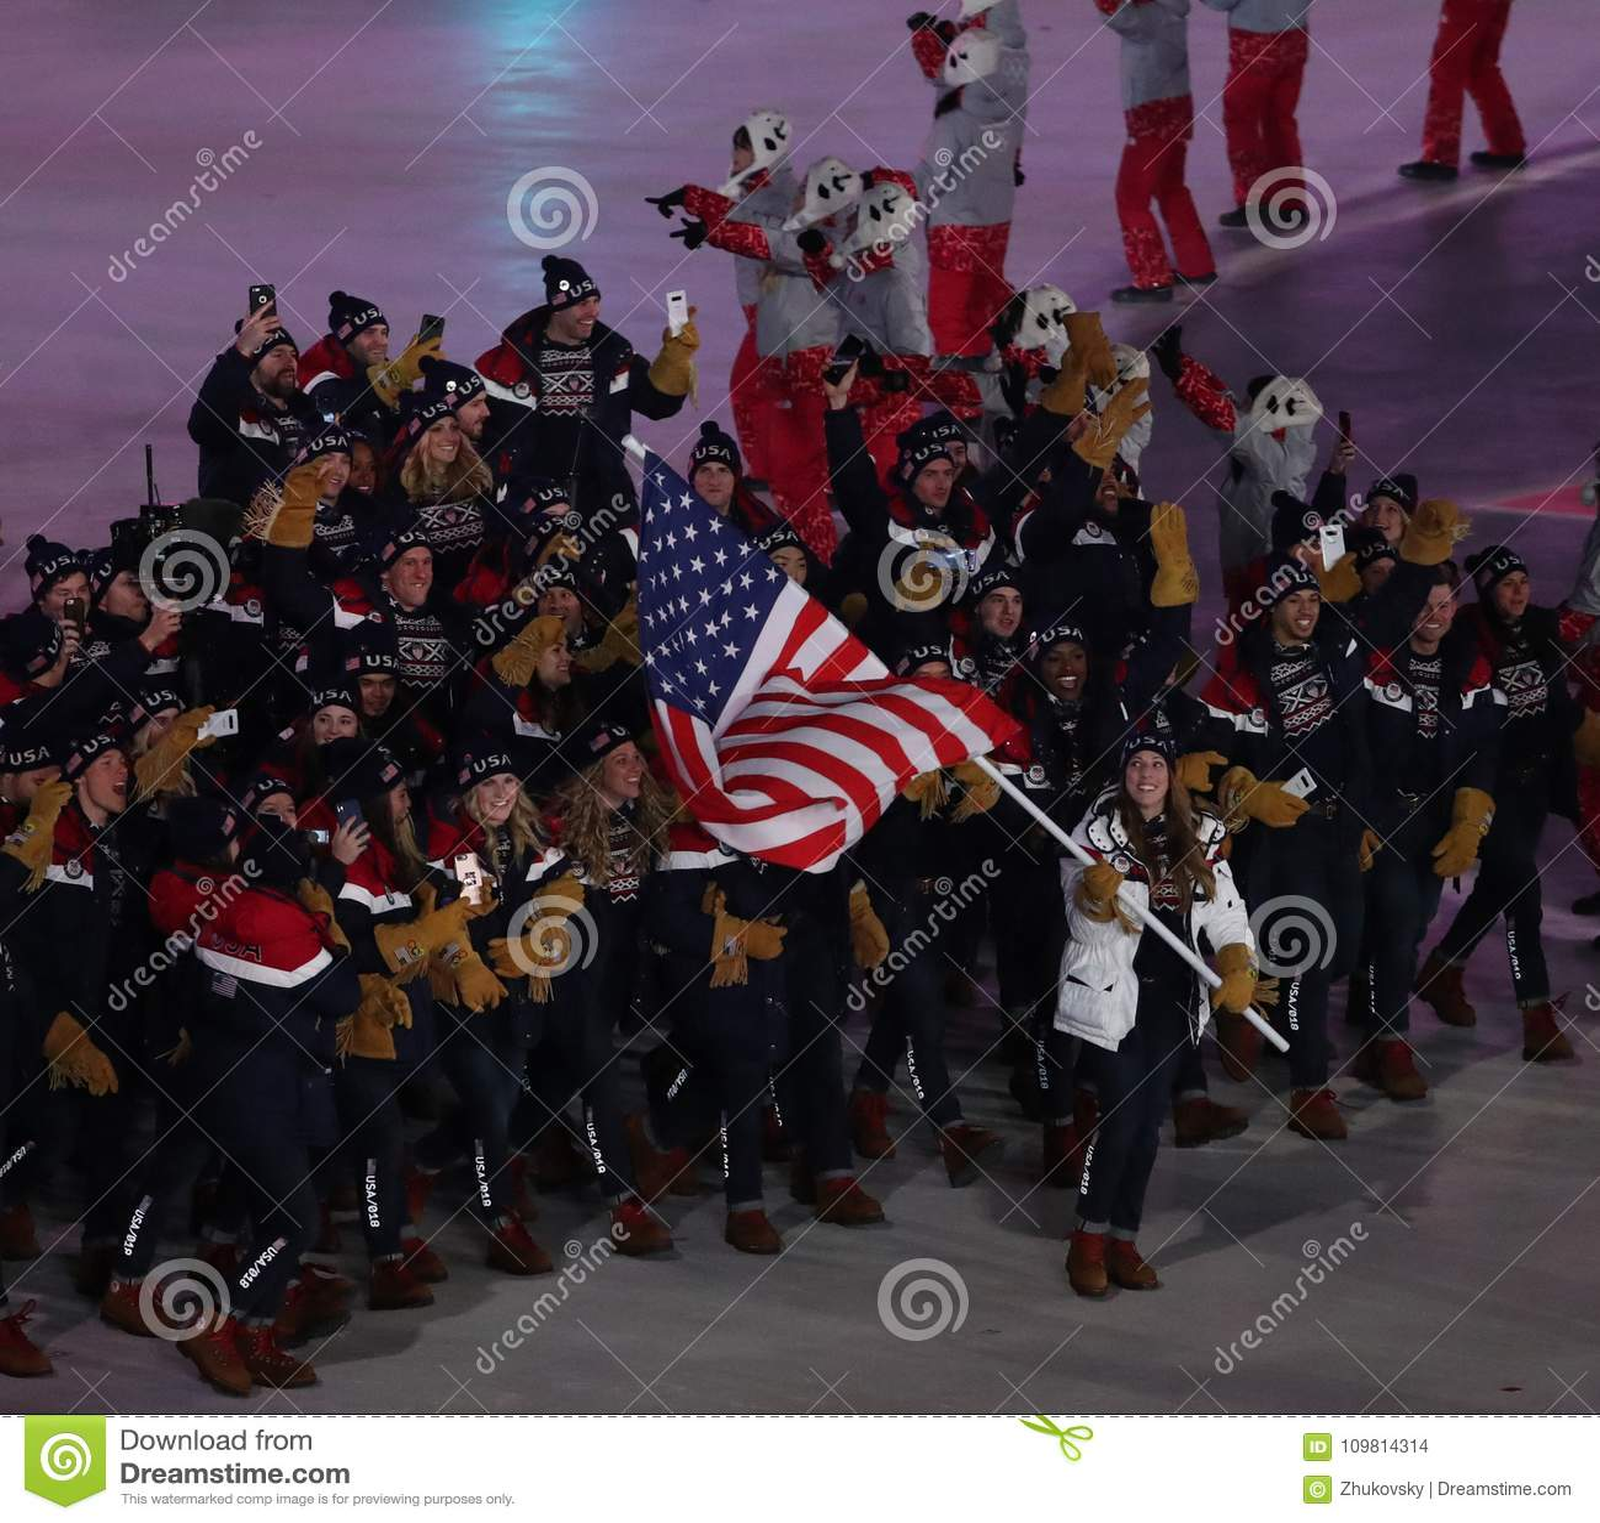 88cf93c6 Olympic Champion Erin Hamlin Carrying The United States Flag Leading ...